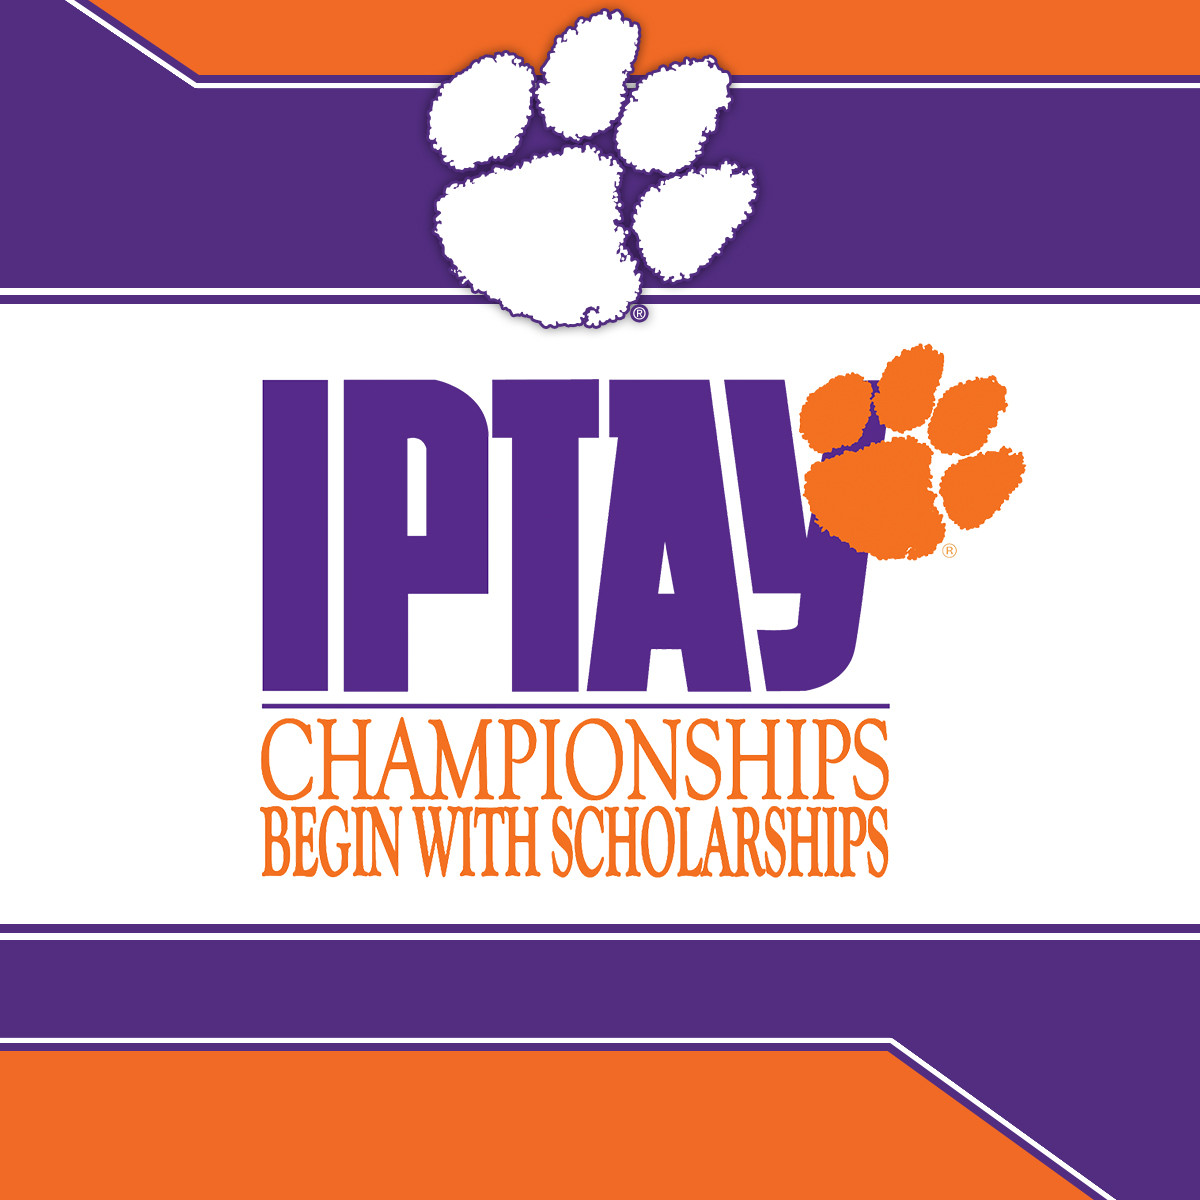 IPTAY Announces Hire of Kyle Shields as Premium Seats Coordinator